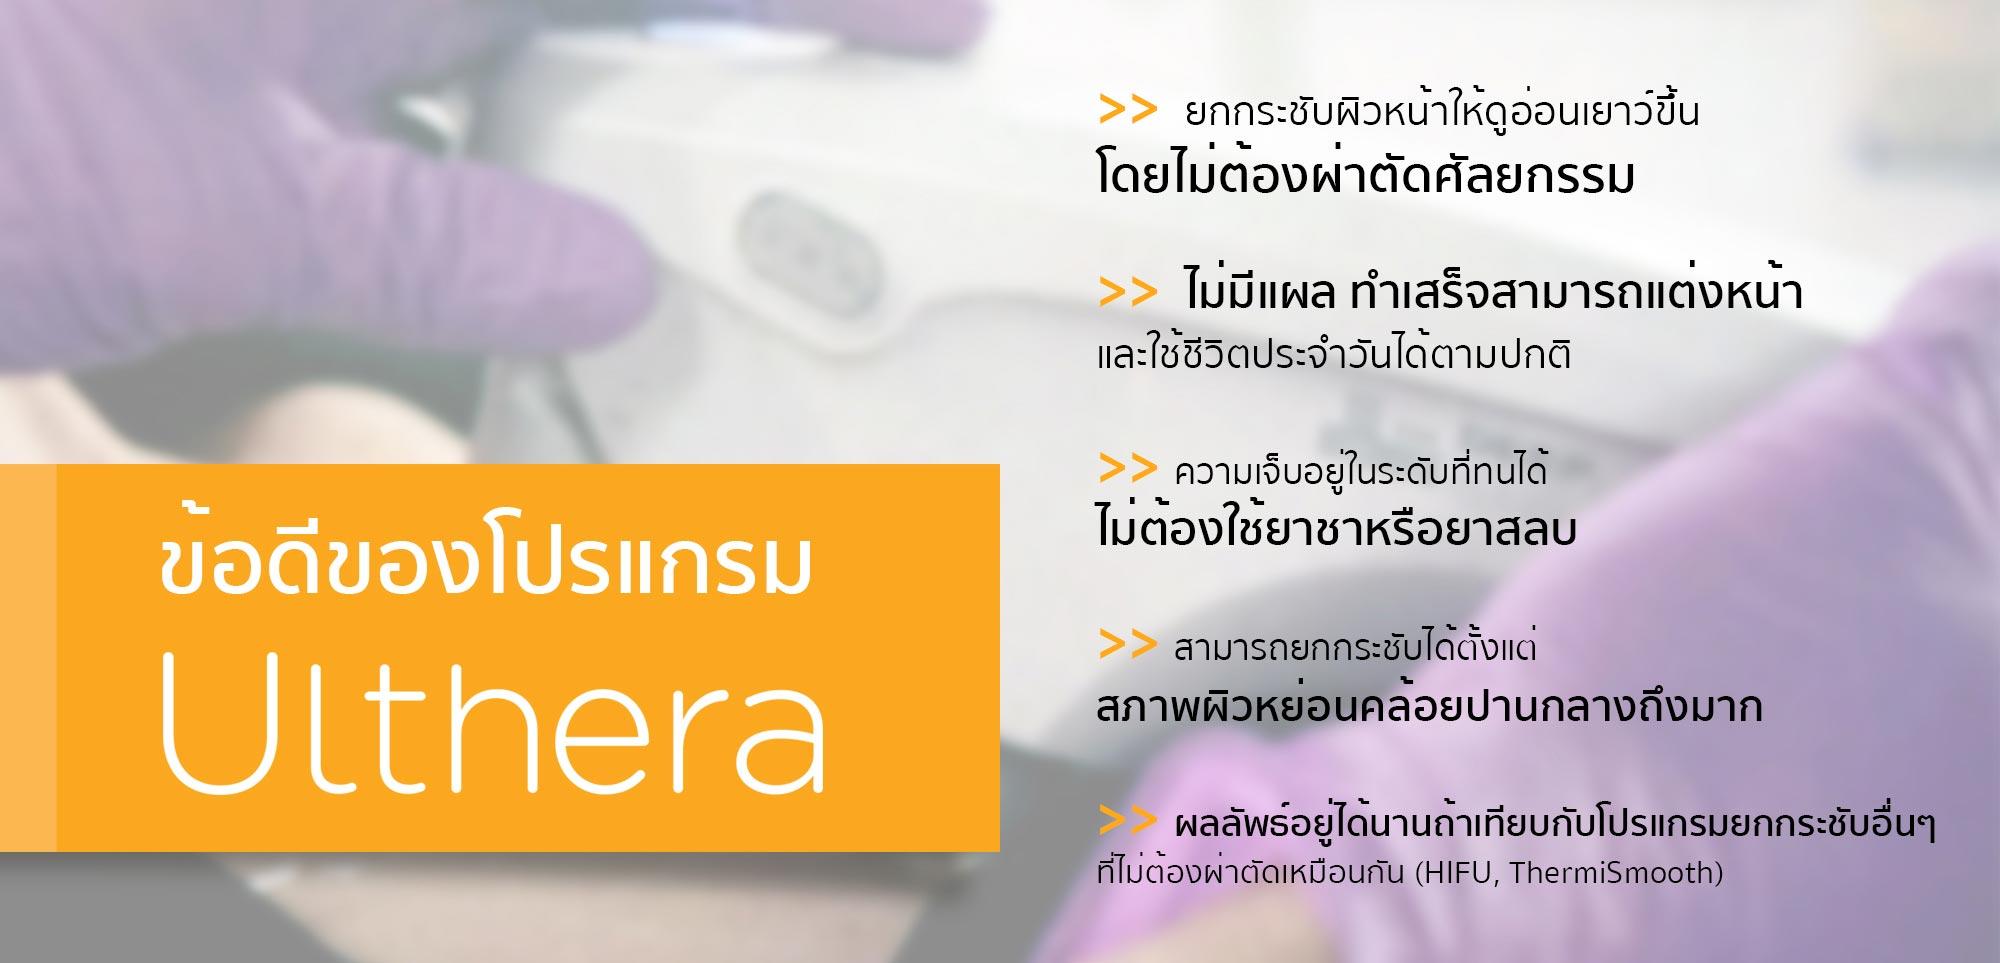 aw3-Ulthera